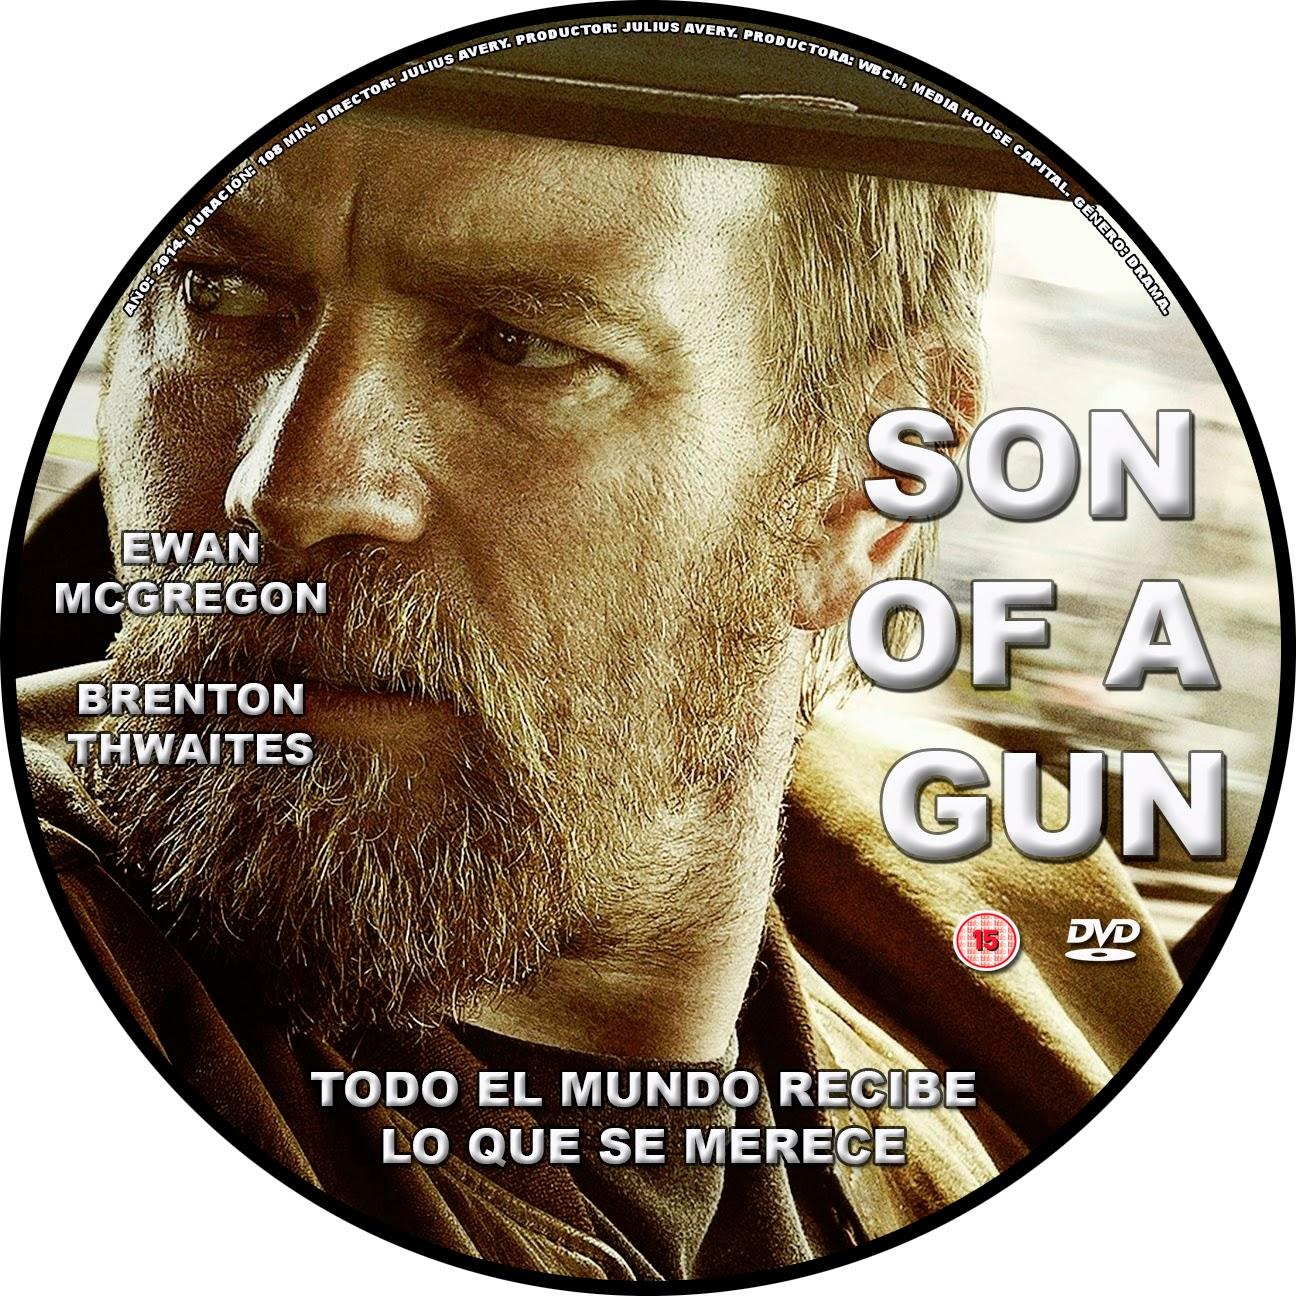 DVD Cover / Caratula FREE: SON OF A GUN - CD COVER